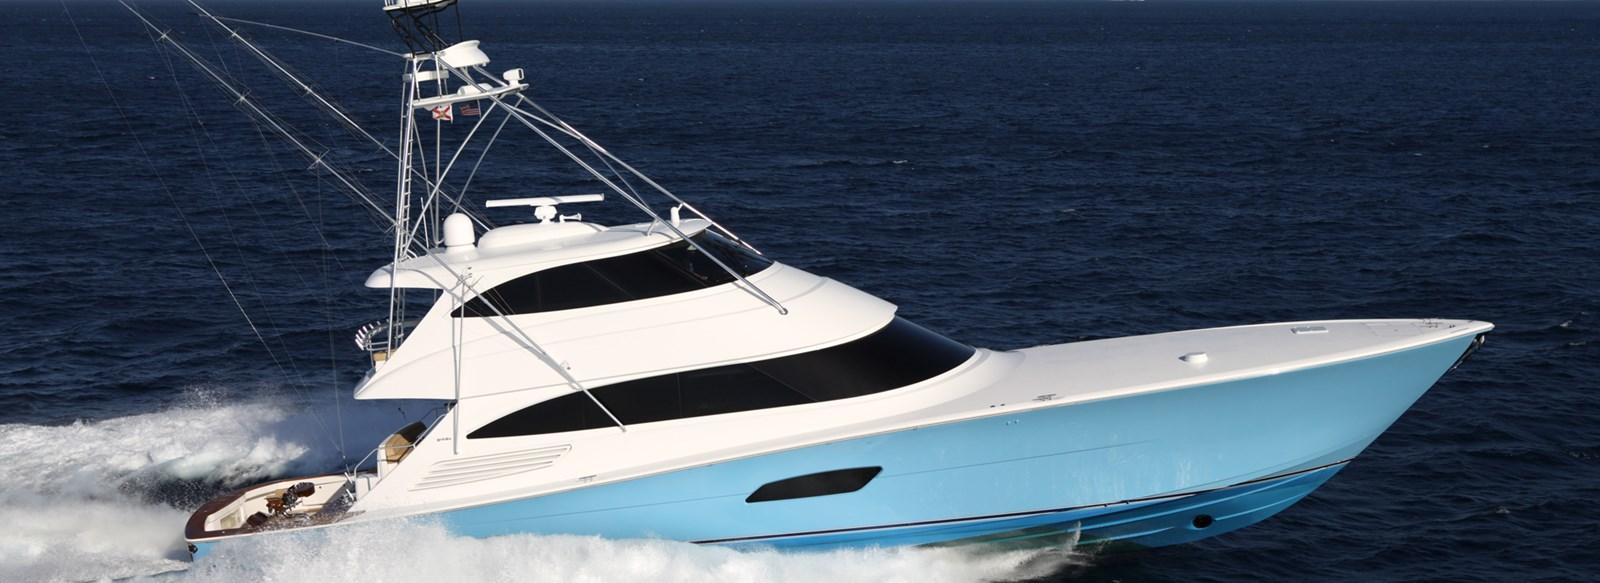 New Viking 92 Enclosed Bridge Yachts For Sale